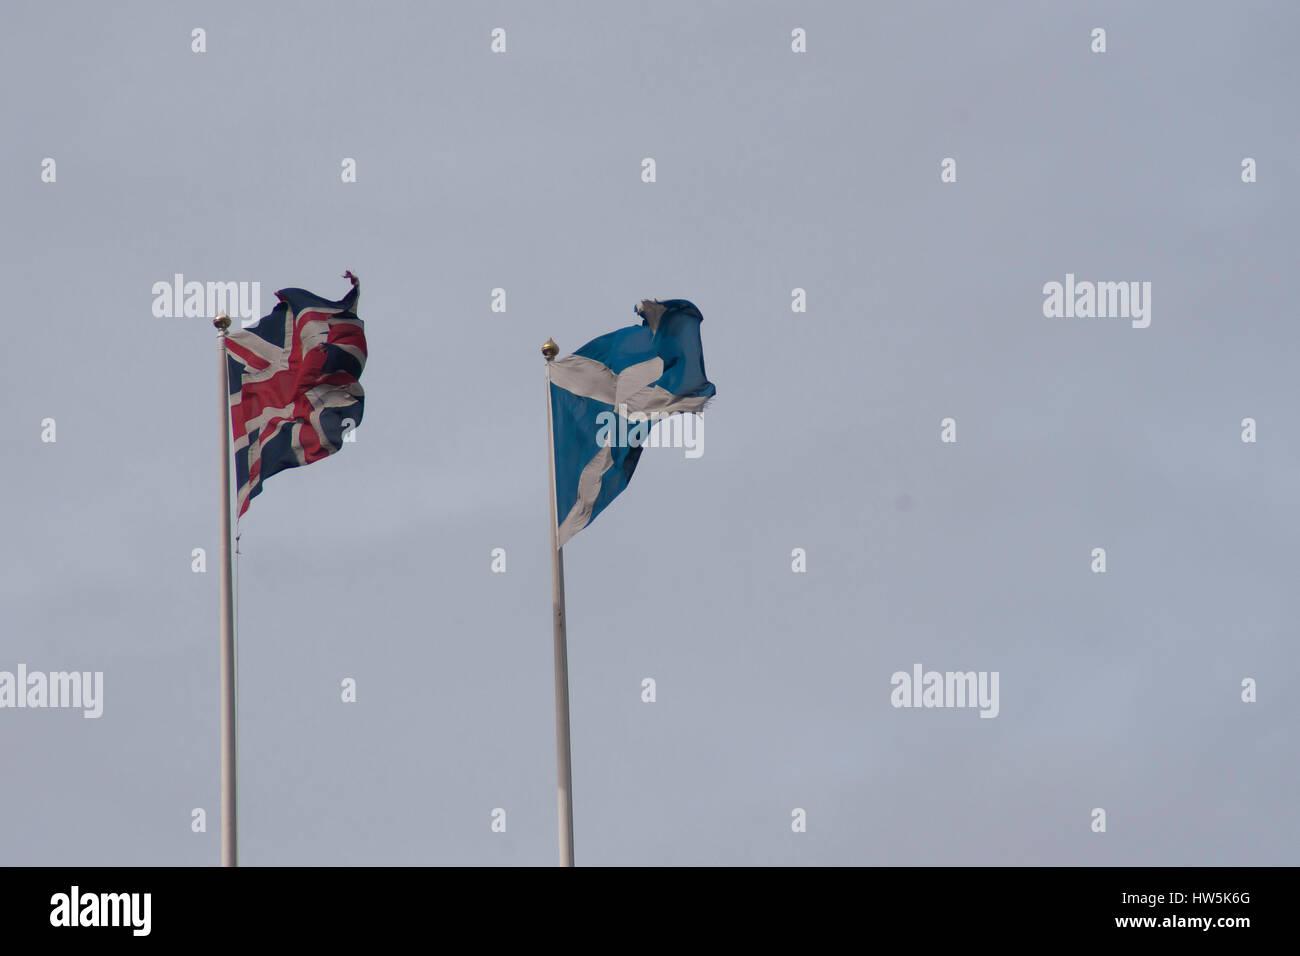 london uk 17th mar 2017 union flag flies near the scottish